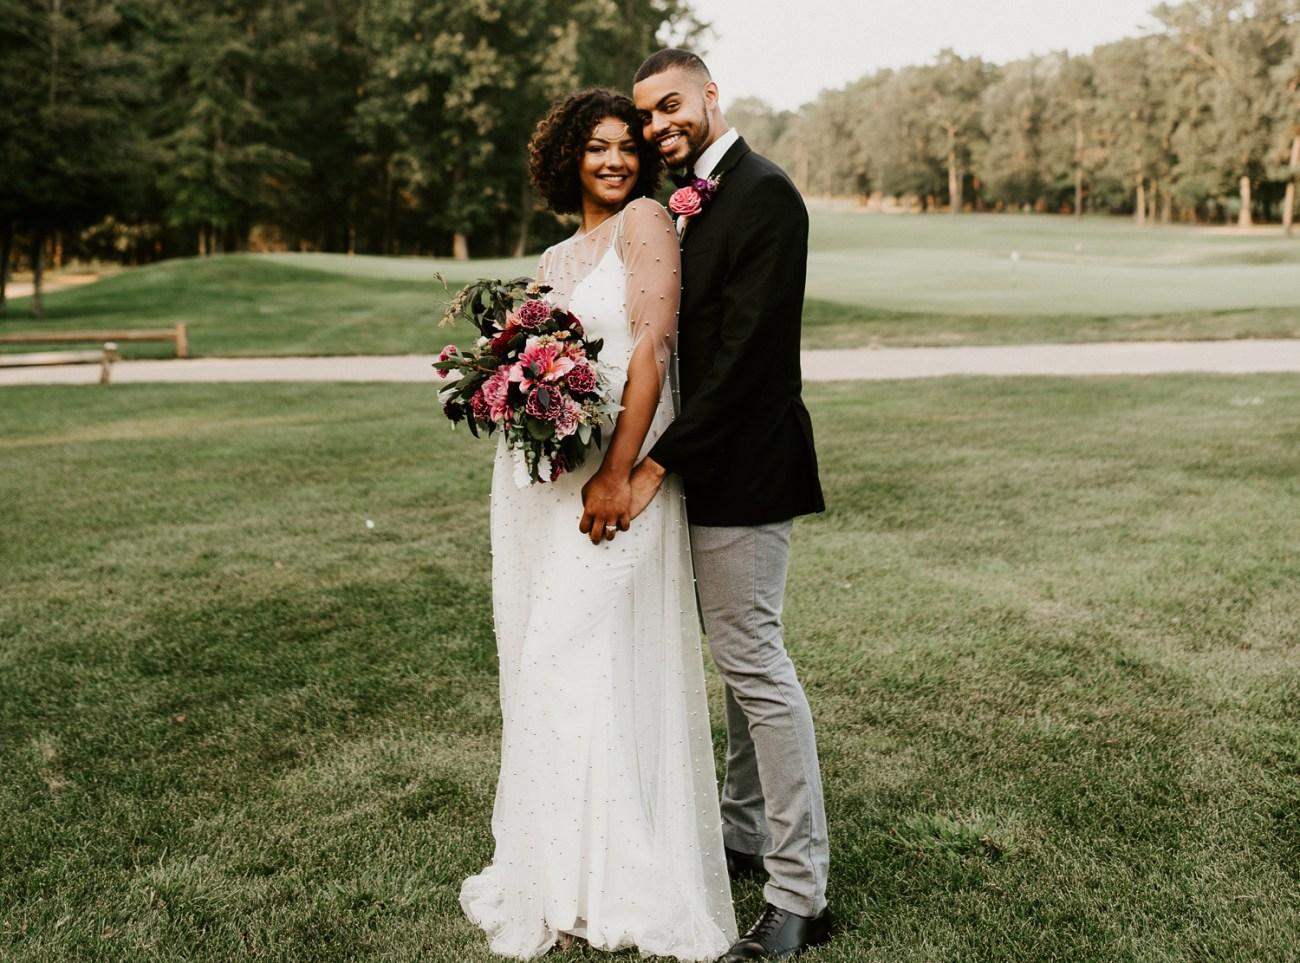 Running Deer Golf Club Boho-Inspired Wedding, New Jersey Wedding Photographer Anais Possamai Photography